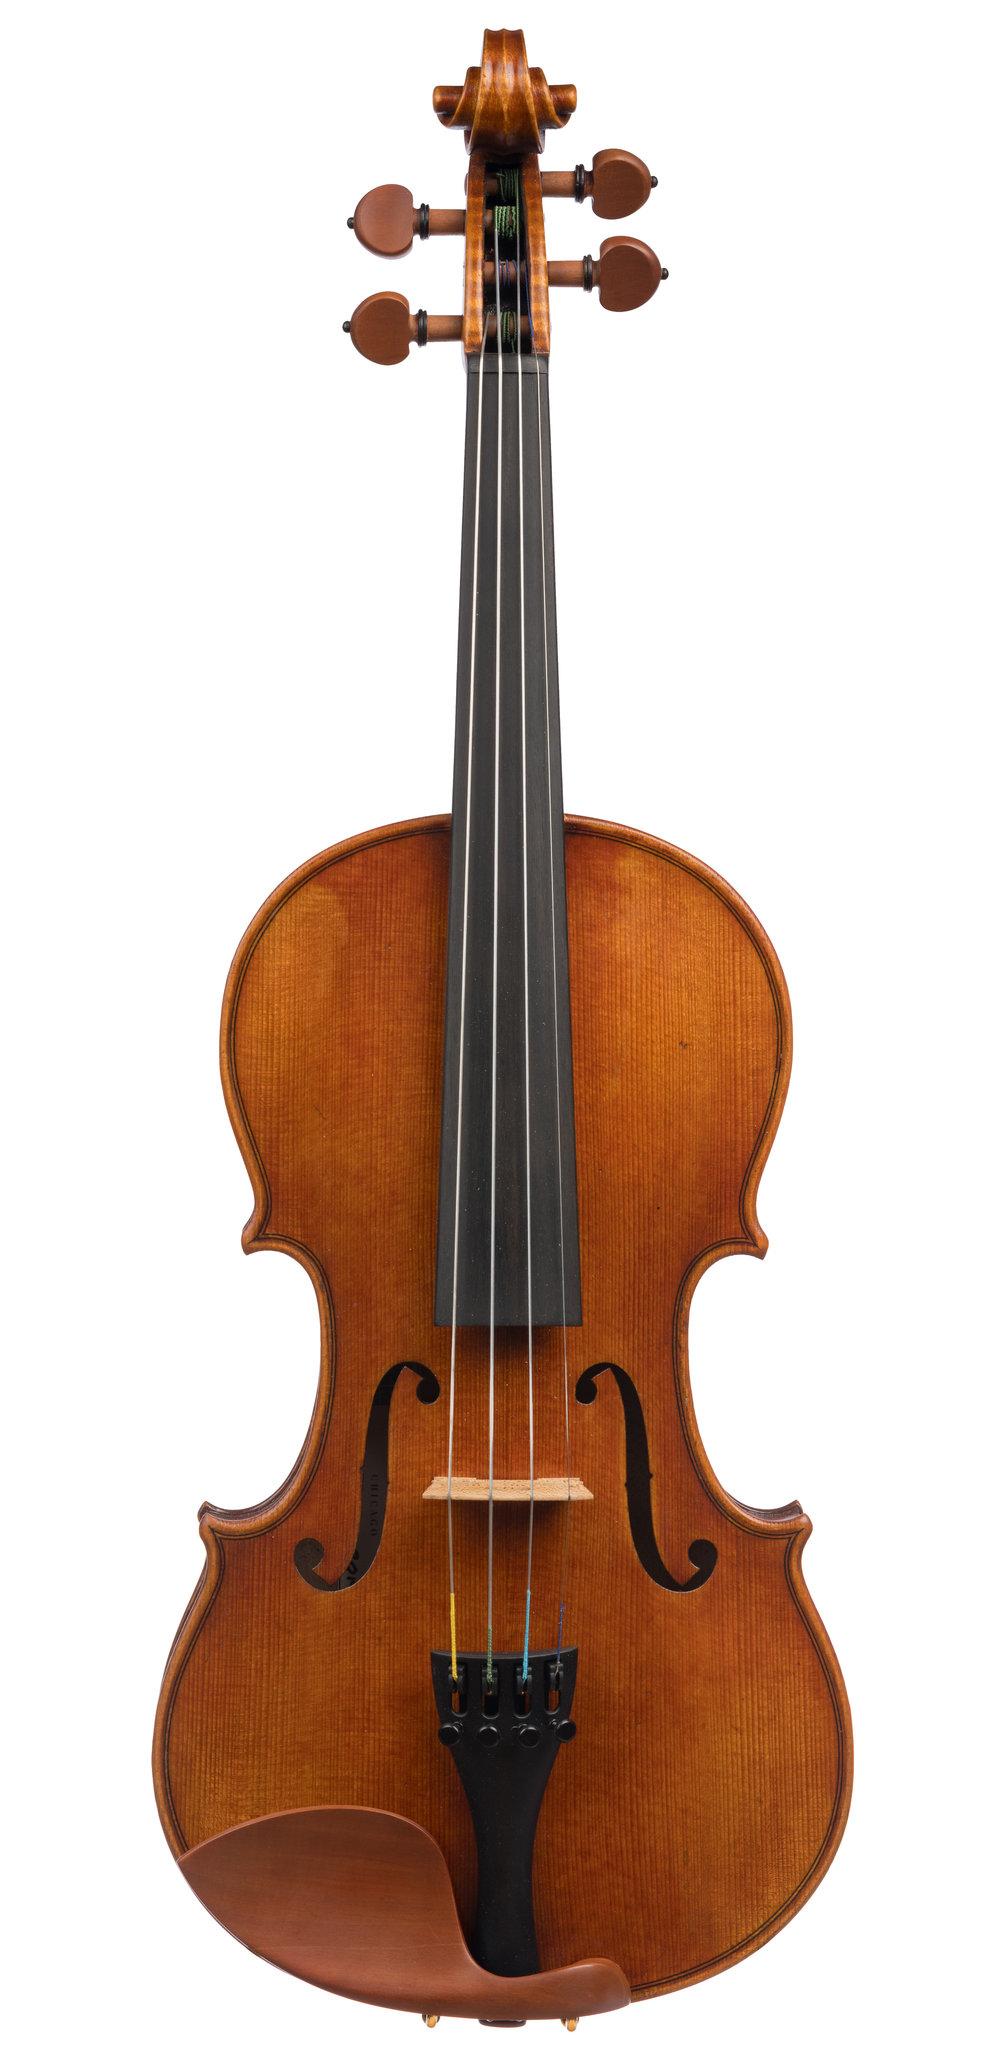 Seman Violins SV200, 7/8 size -